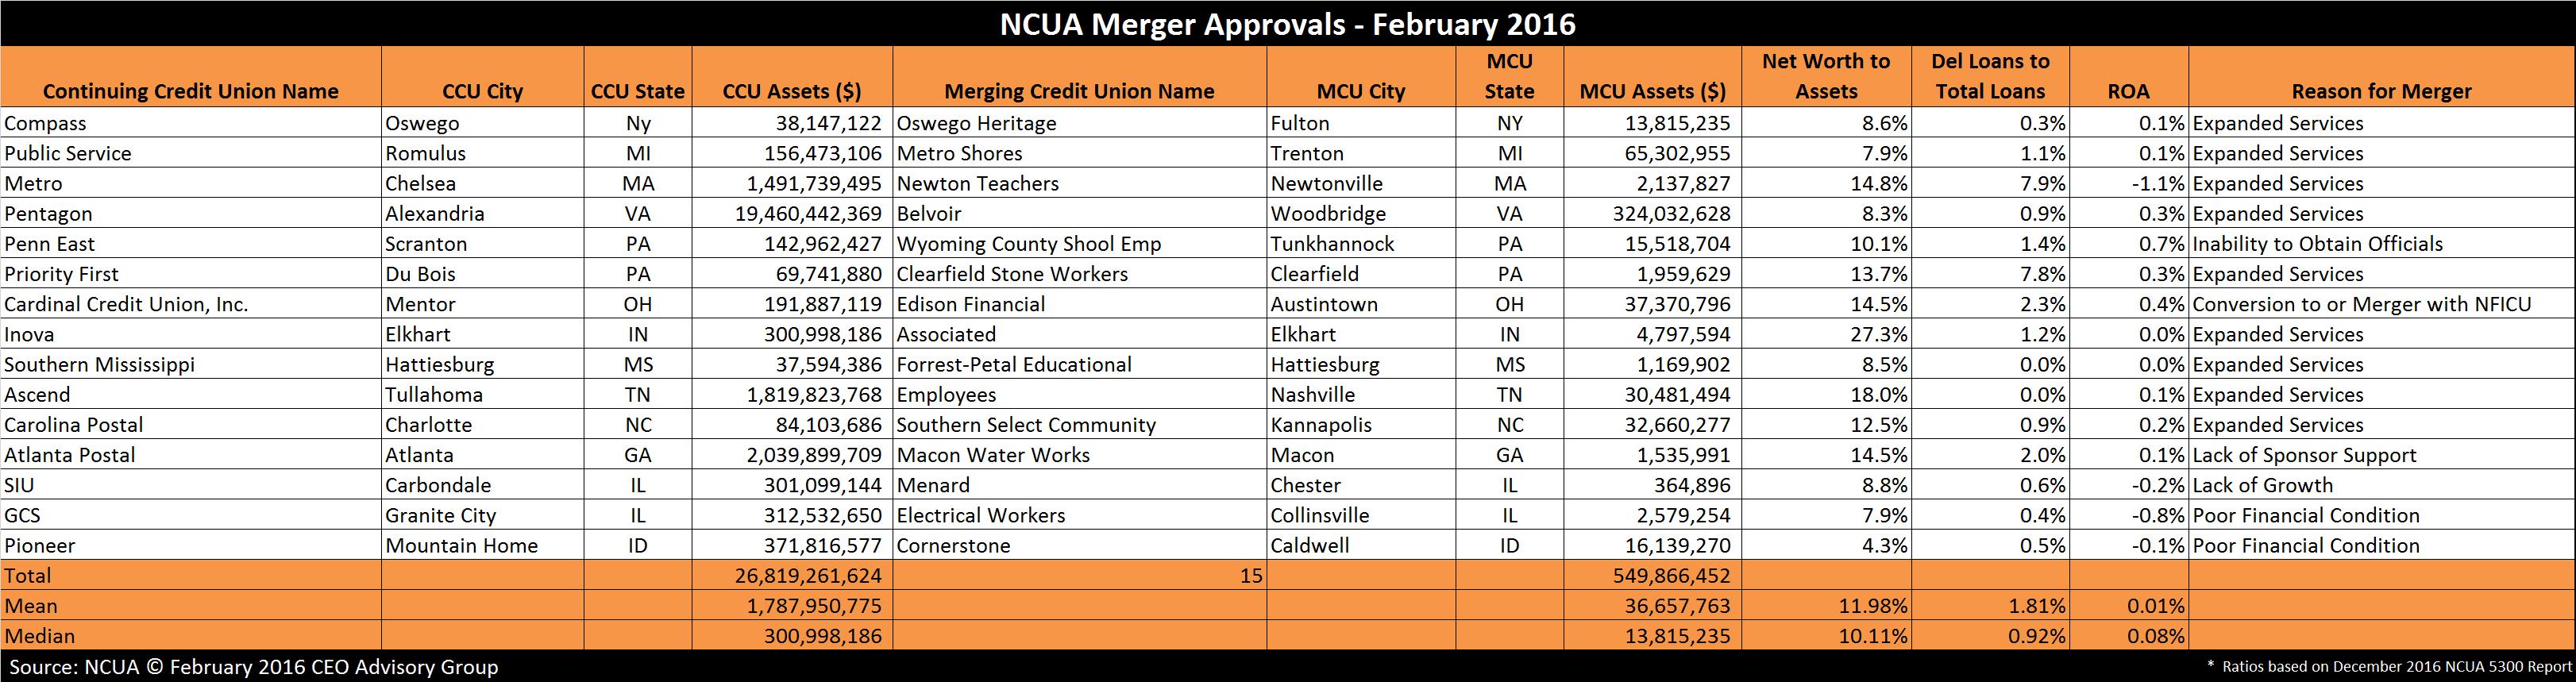 NCUA Approved Mergers - February 2016